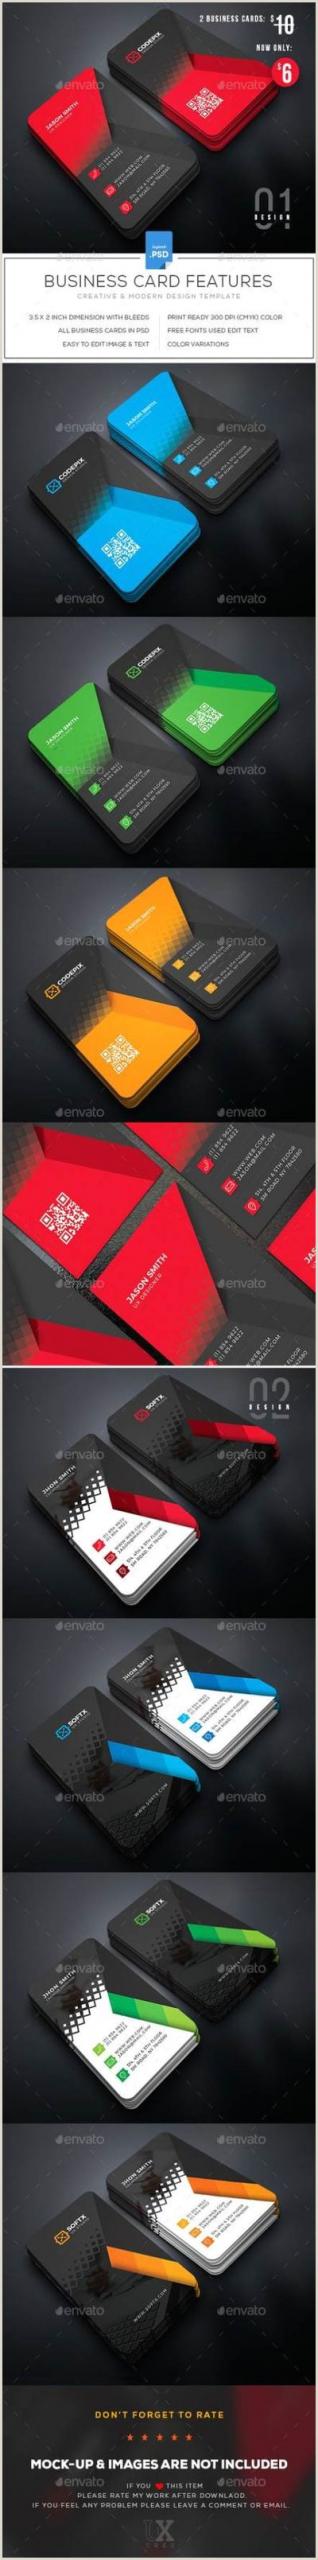 Modern Graphic Design Business Card Designs Creative Modern Polygon Business Card